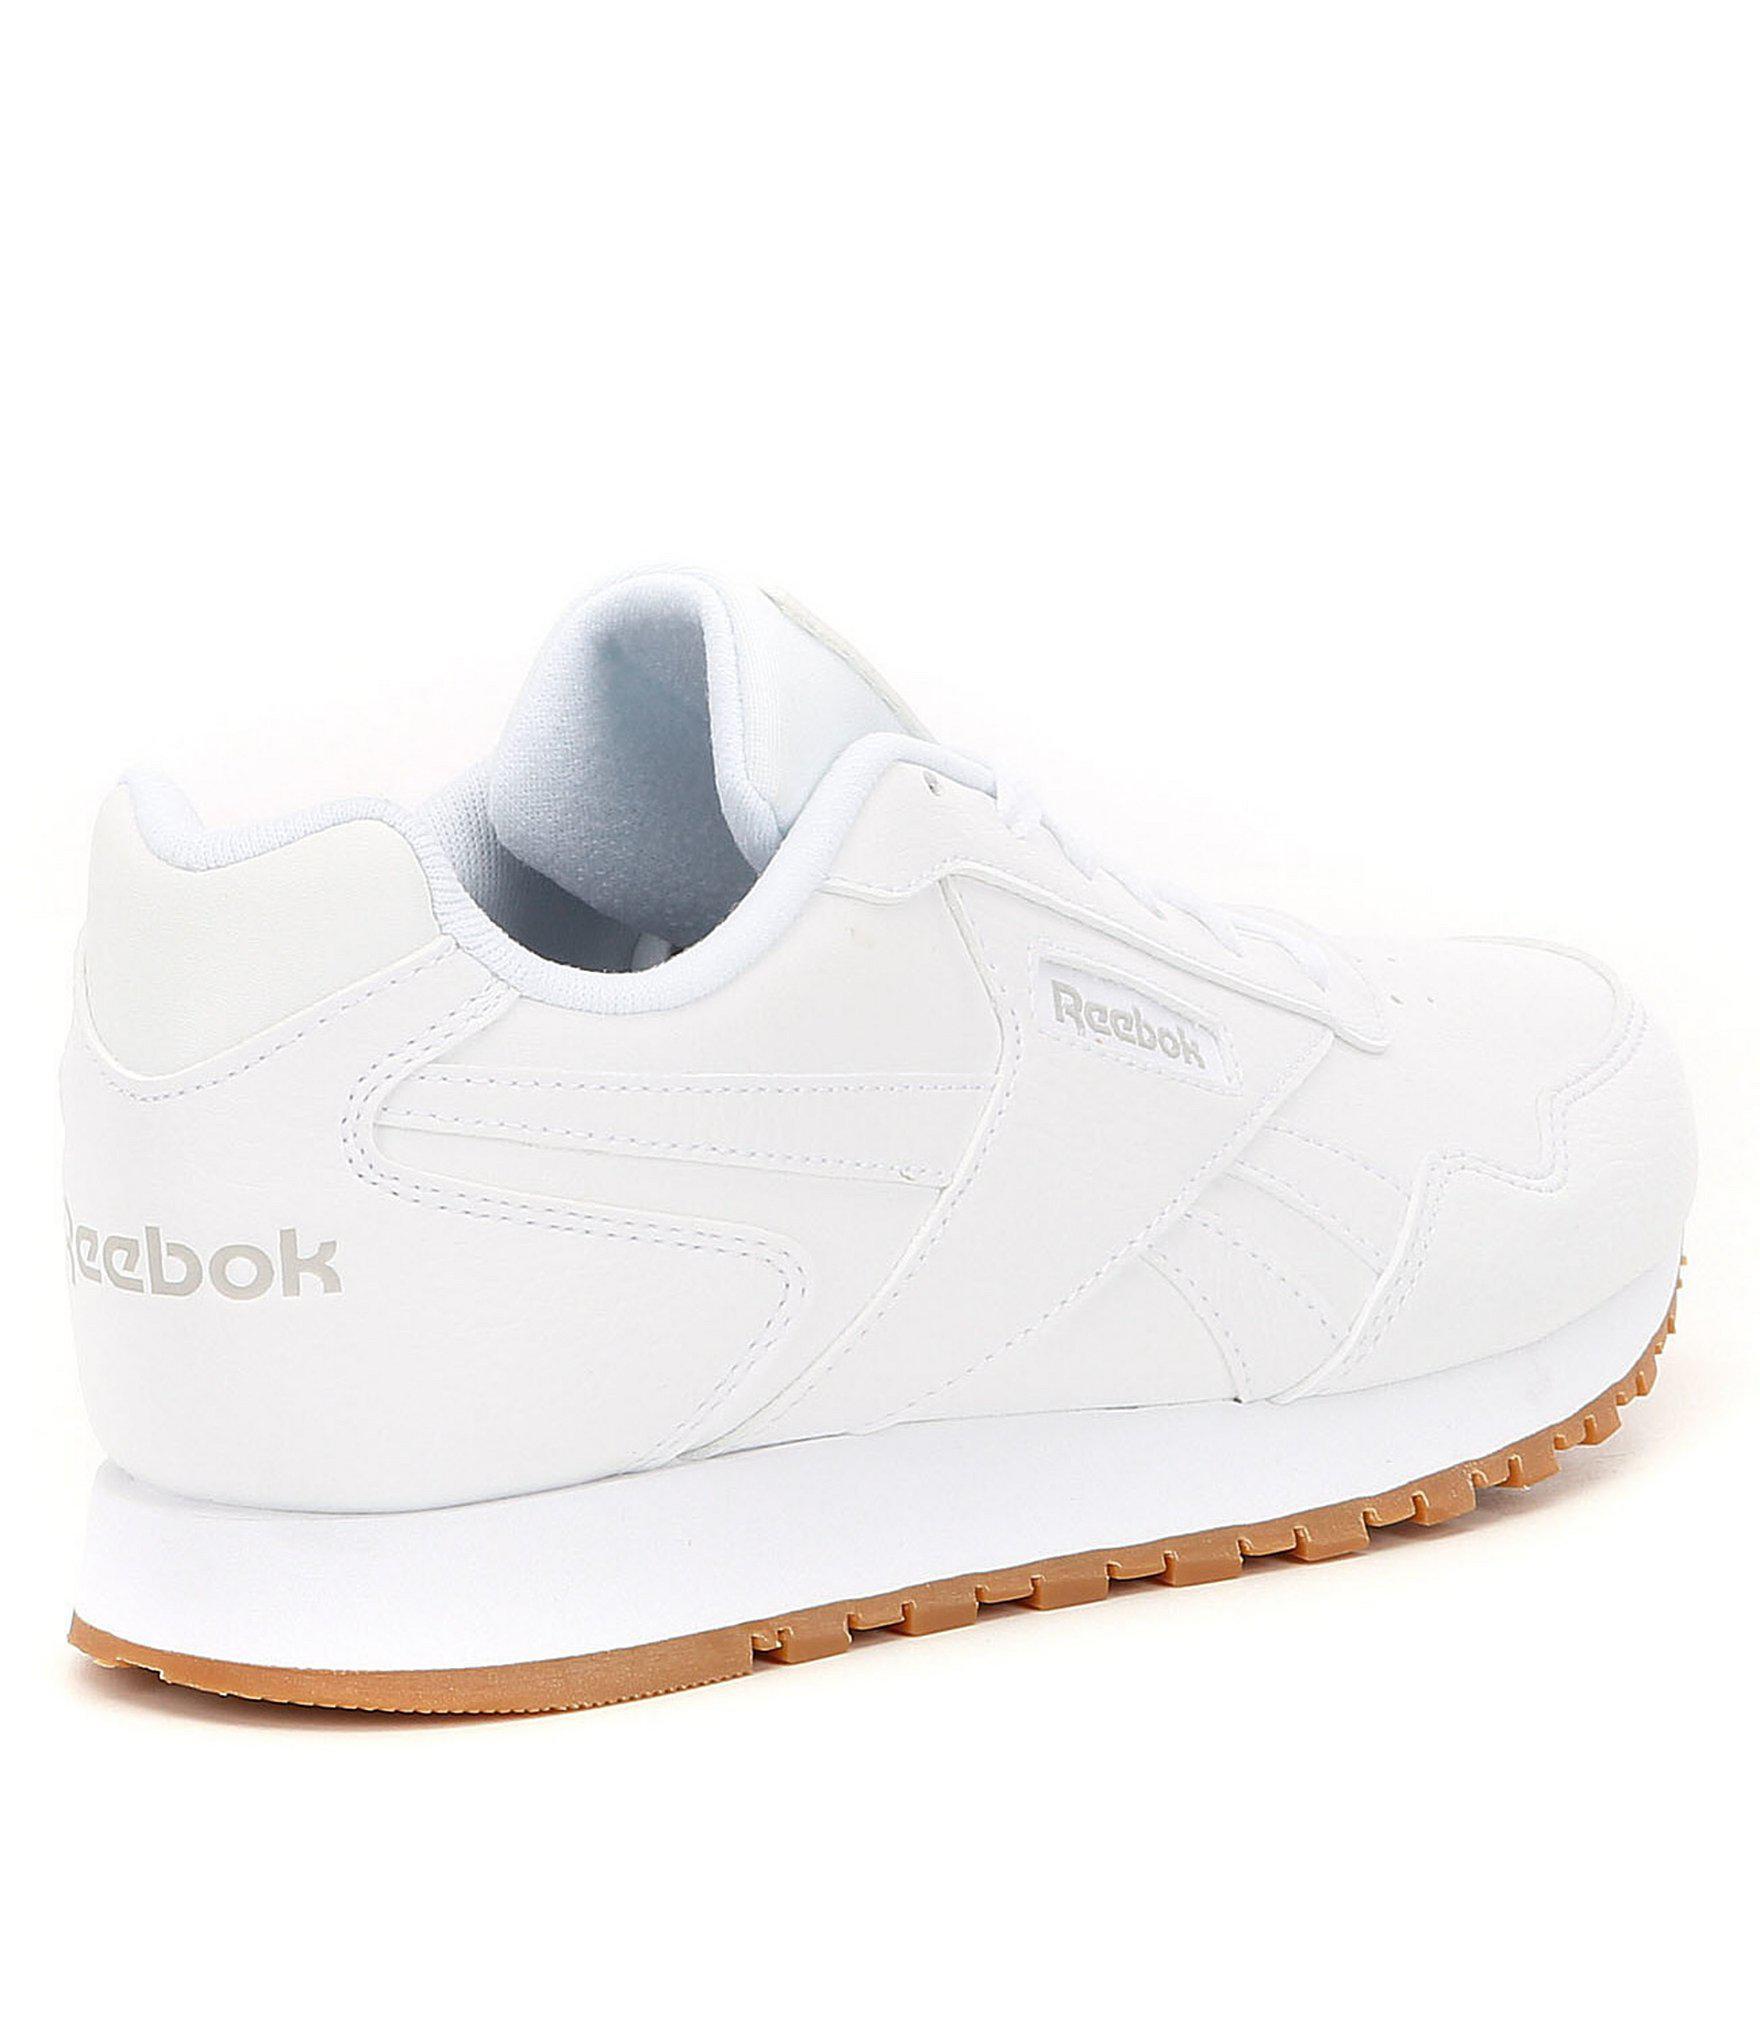 a62b6bb3006 Reebok - White Women ́s Classic Harman Run Shoes - Lyst. View fullscreen